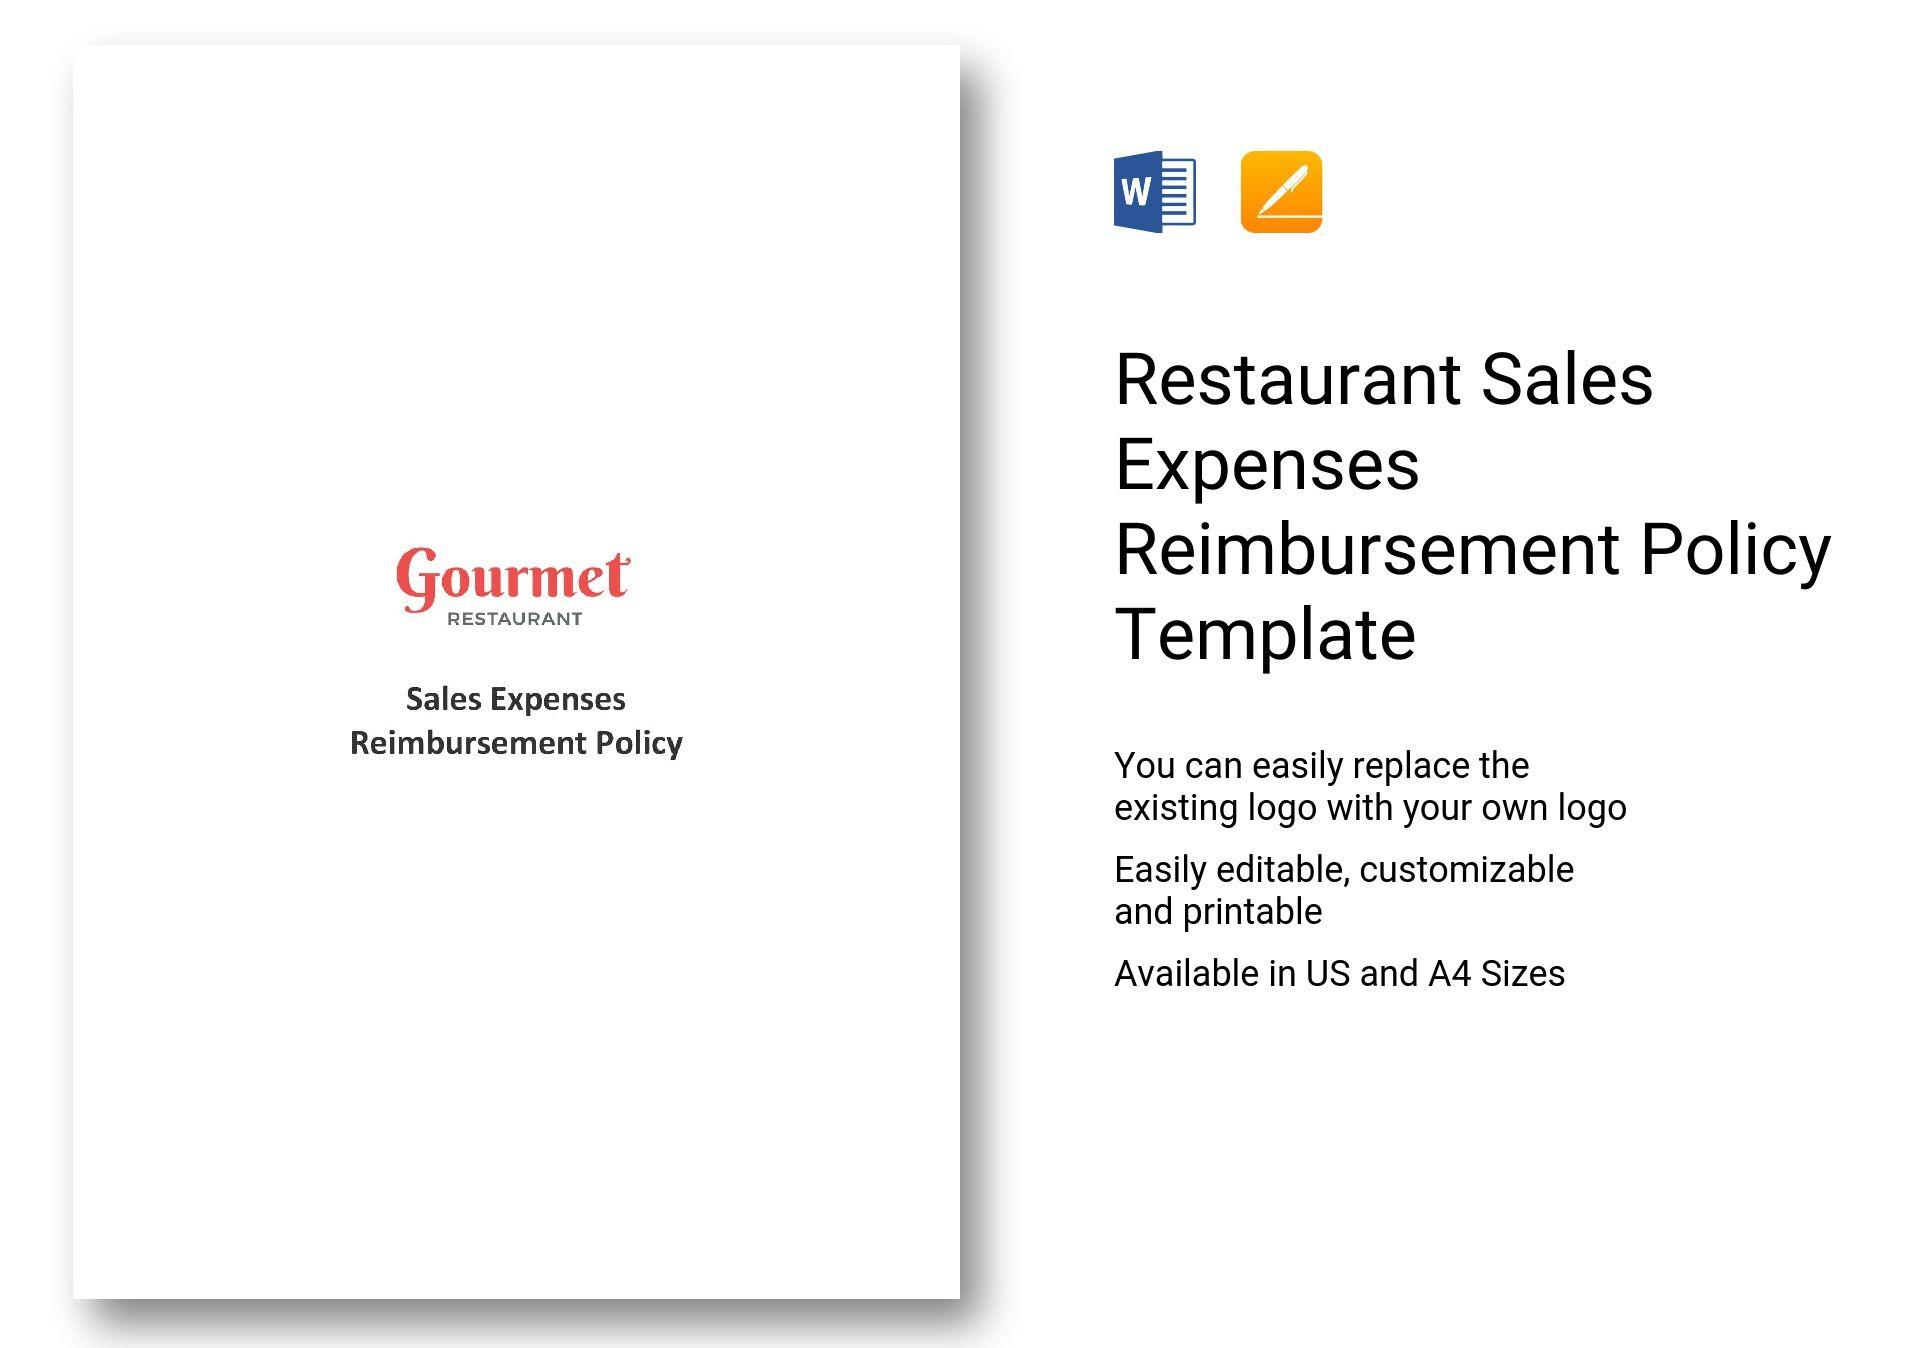 Restaurant Sales Expenses Reimbursement Policy